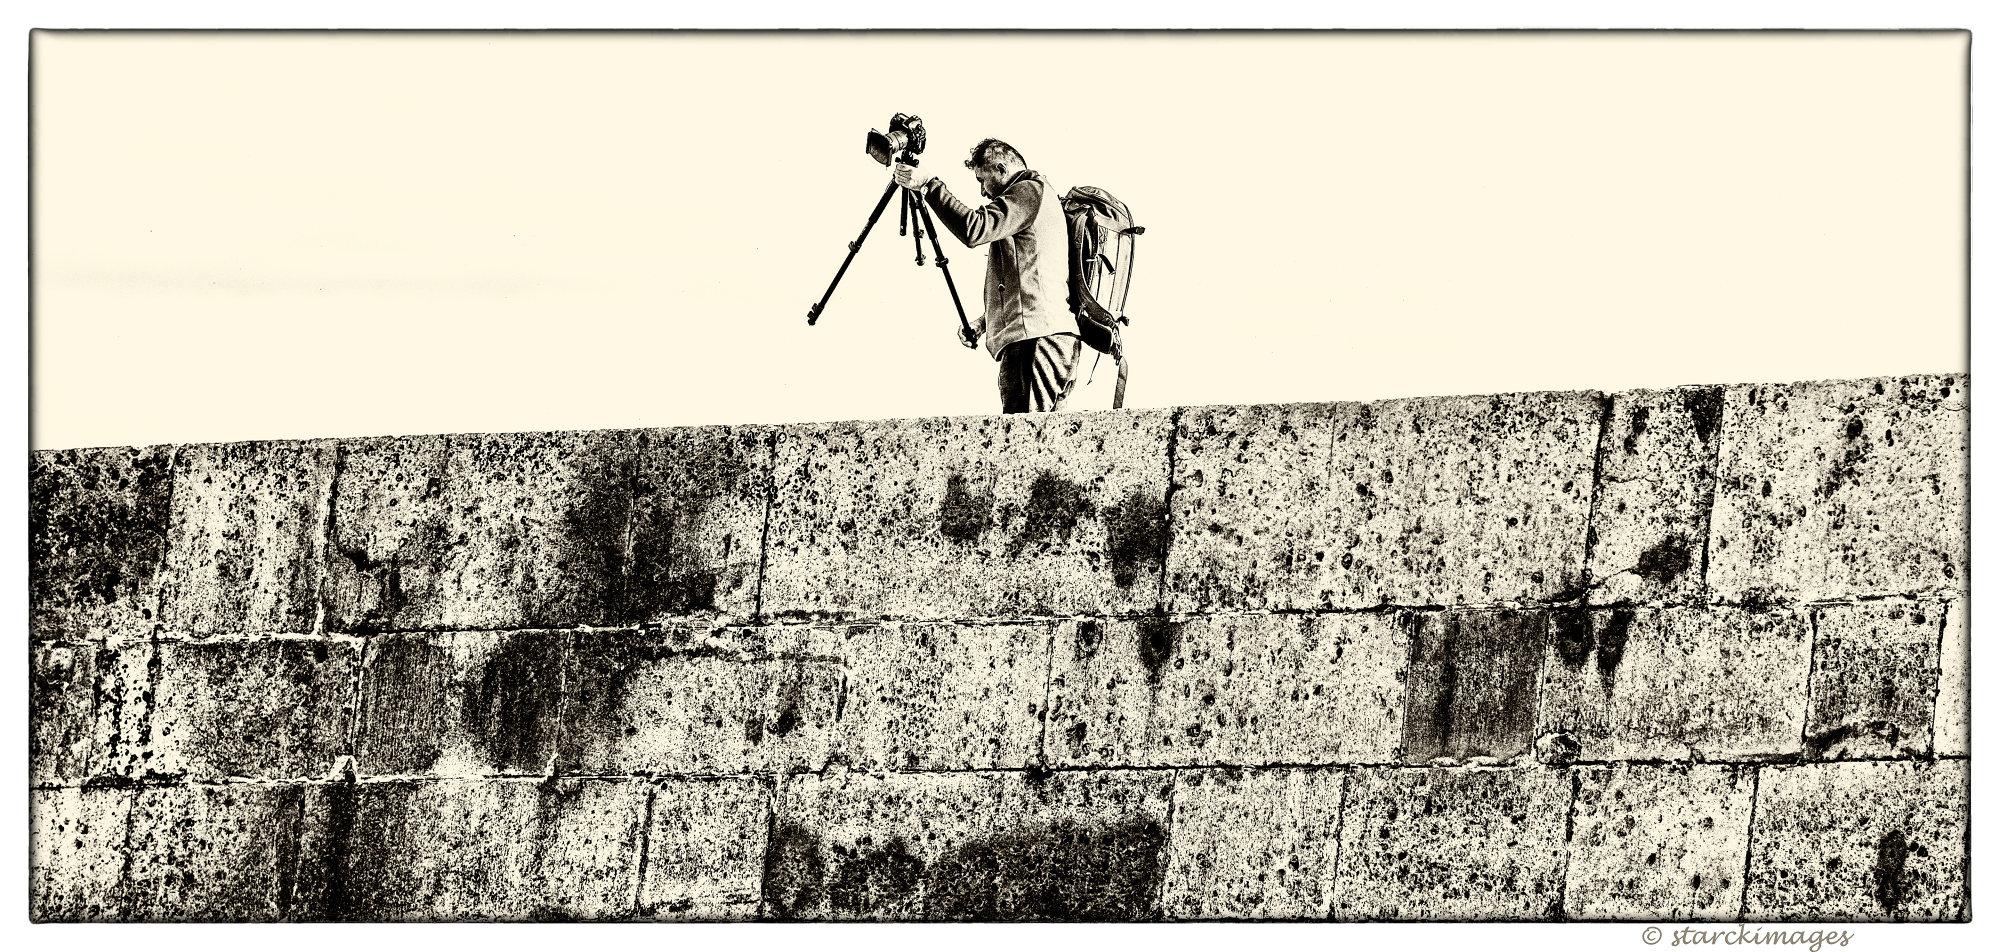 Camera Shift